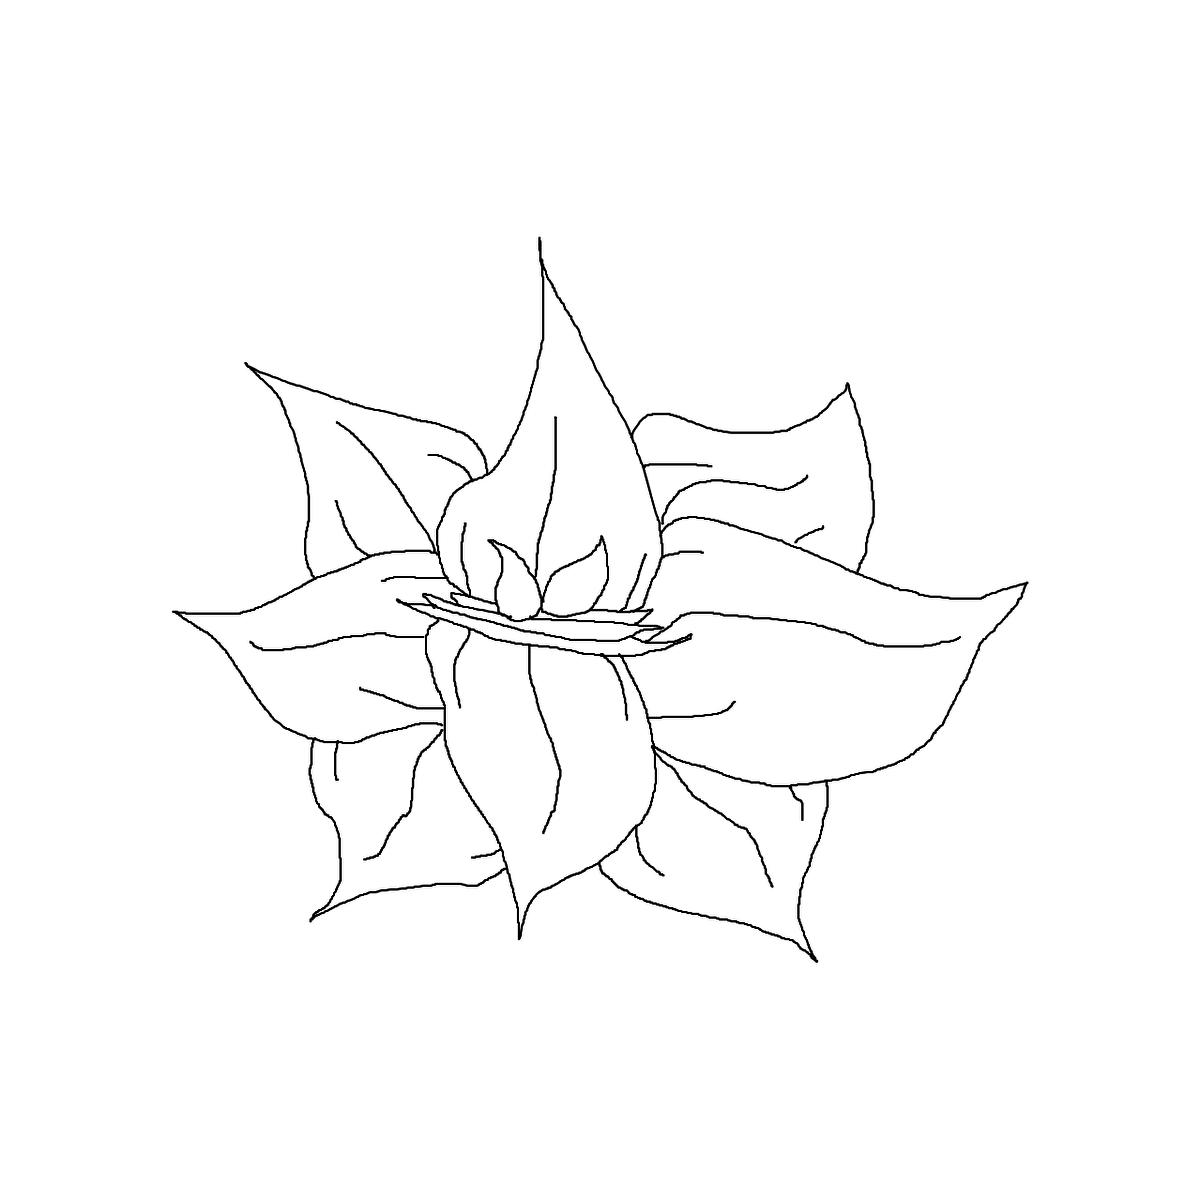 BAAAM drawing#7997 lat:47.0238800048828100lng: -55.5727348327636700